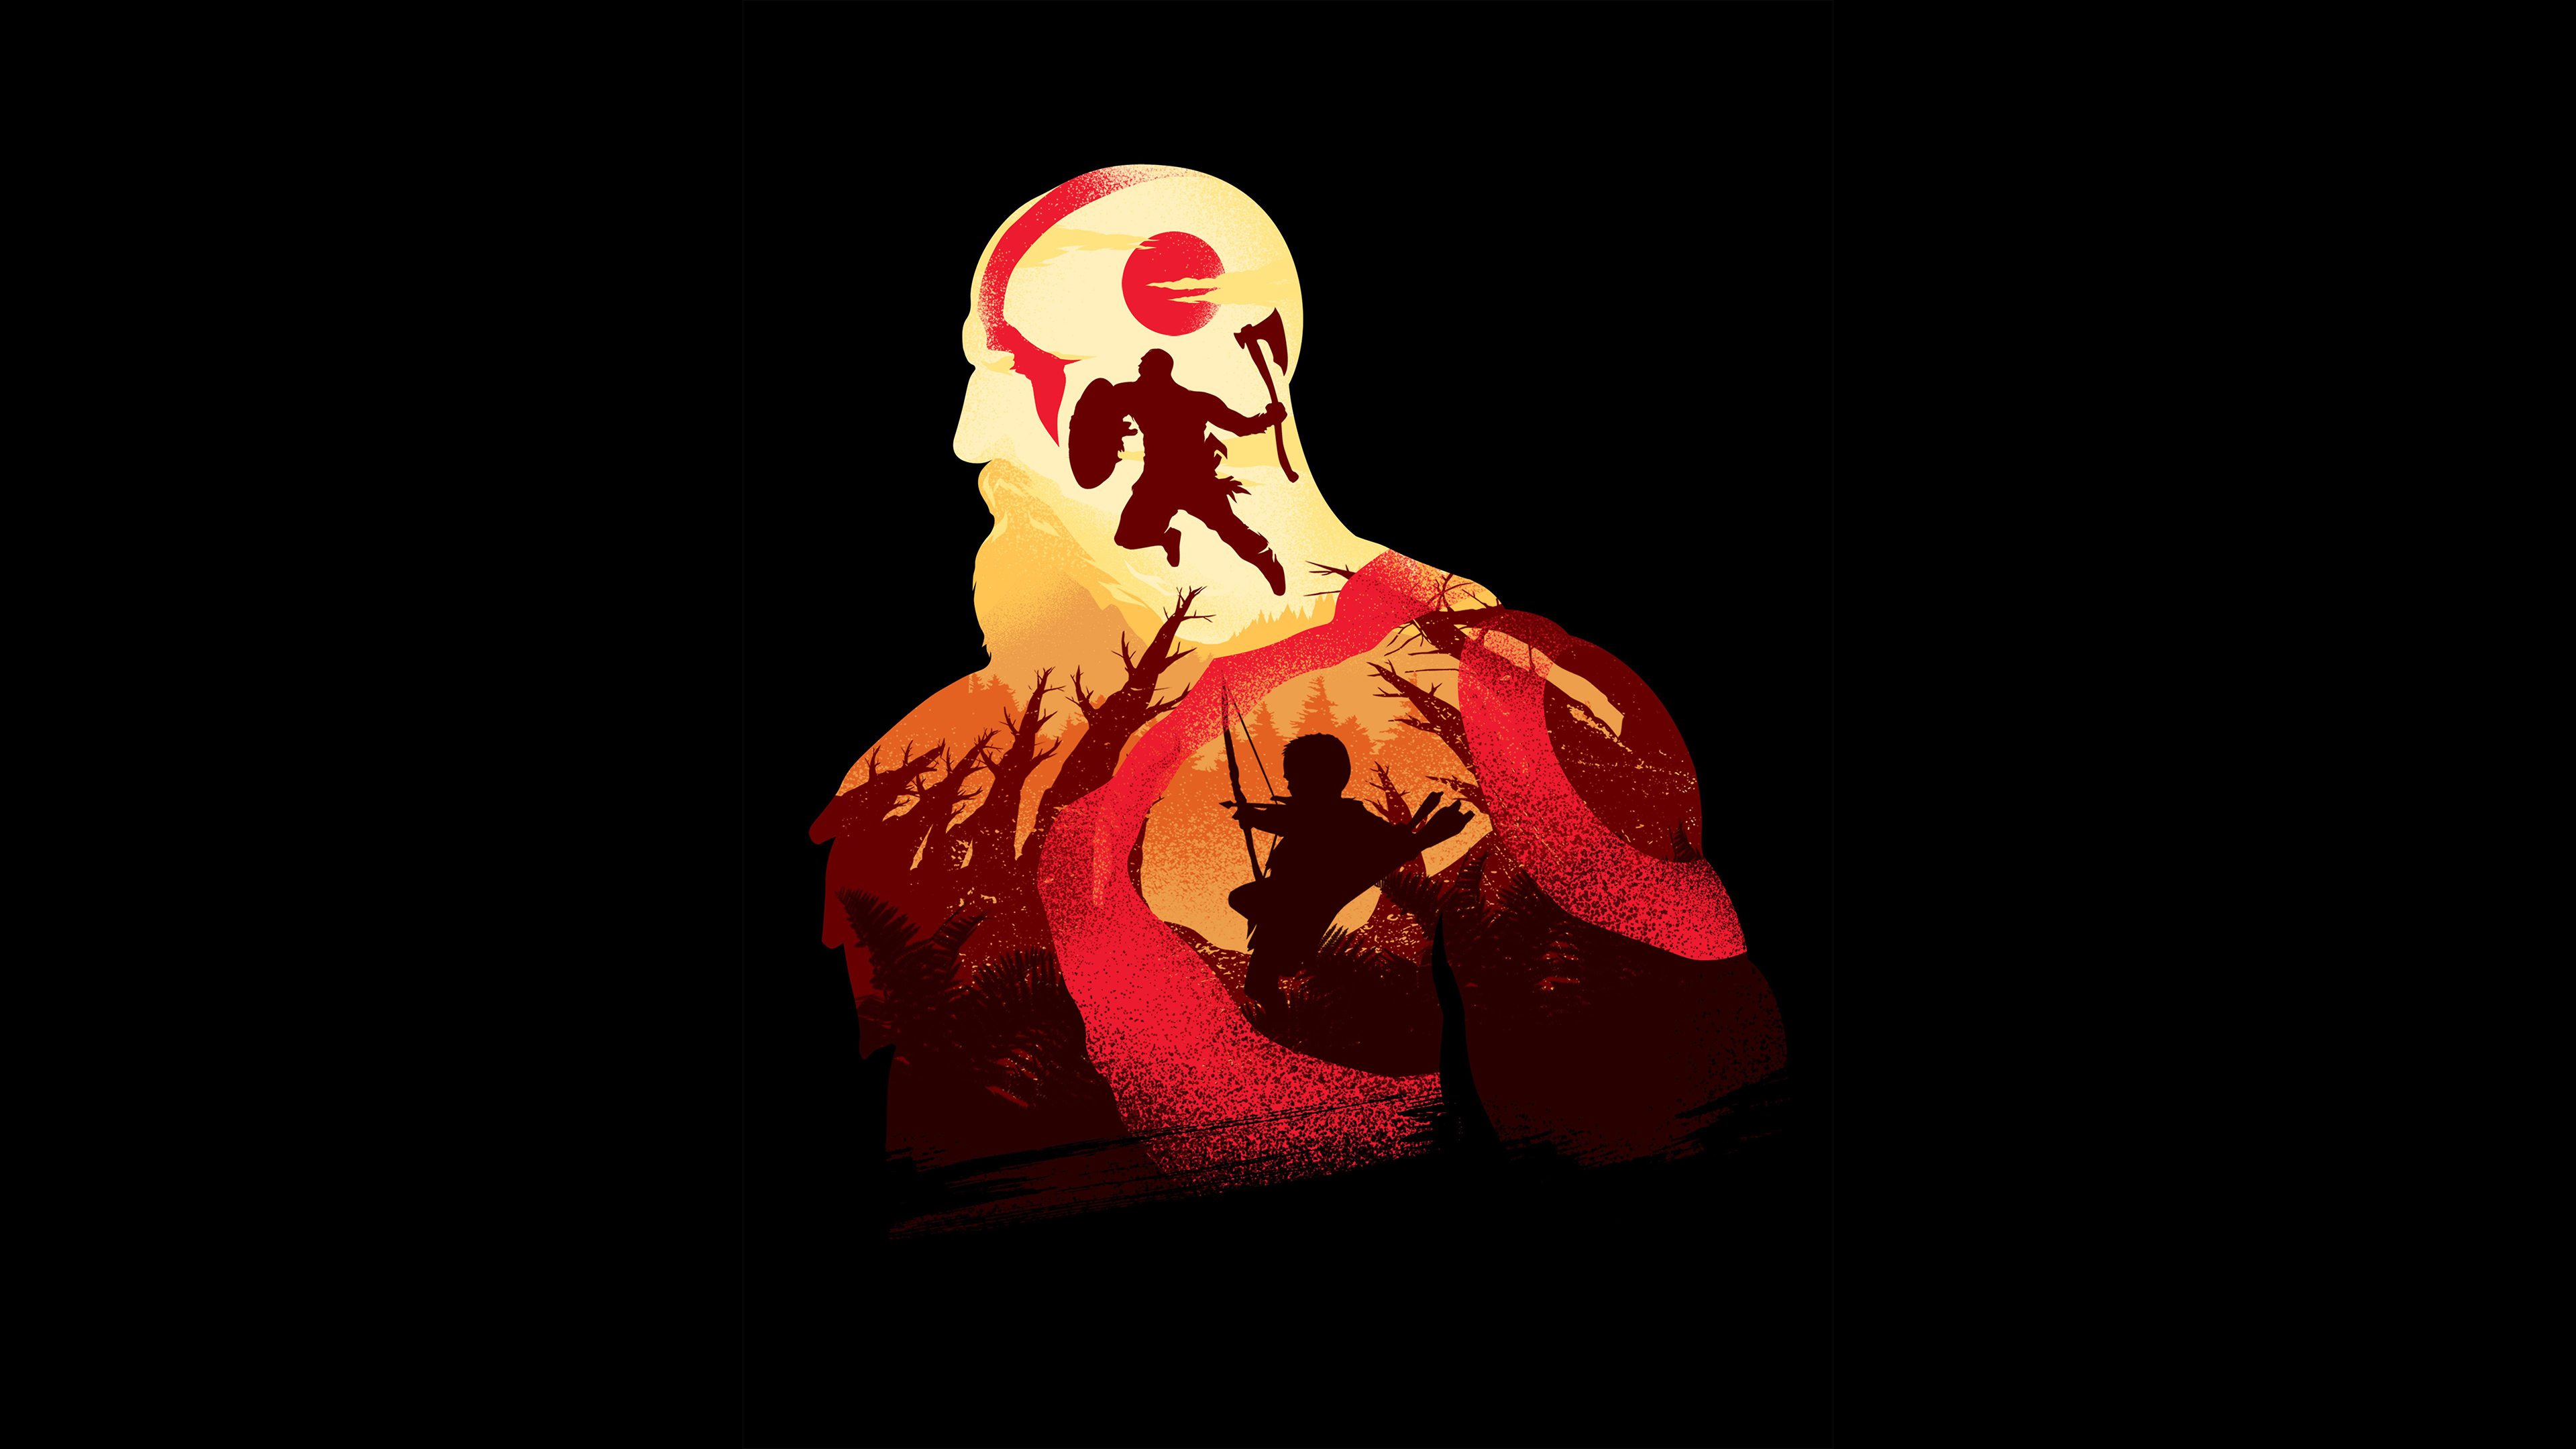 1080x1920 Daredevil Minimalism Iphone 7 6s 6 Plus Pixel: 1080x1920 Kratos In God Of War 4K Minimalism Iphone 7,6s,6